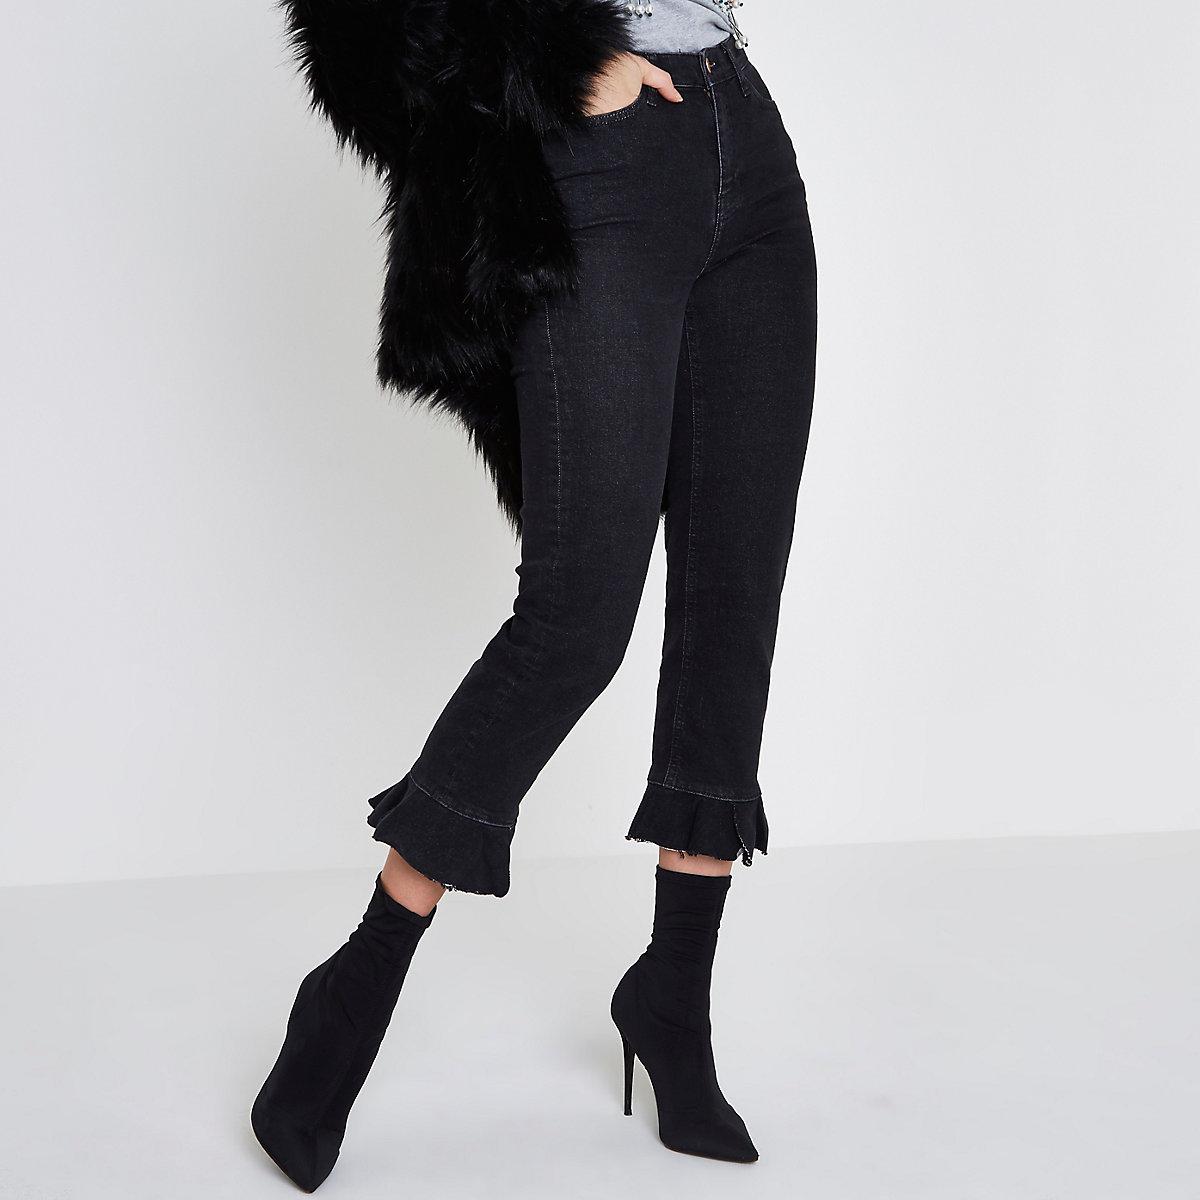 Black Bella frill hem straight leg jeans